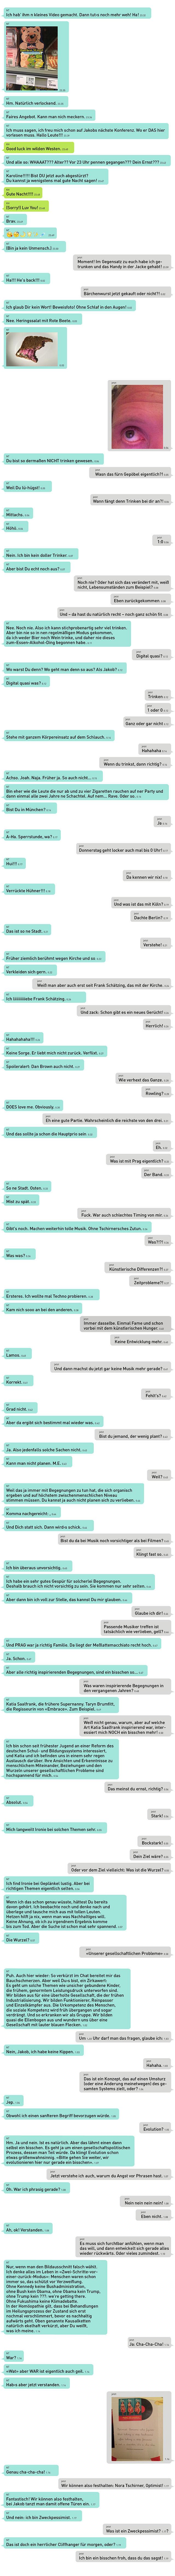 chat2 fin b